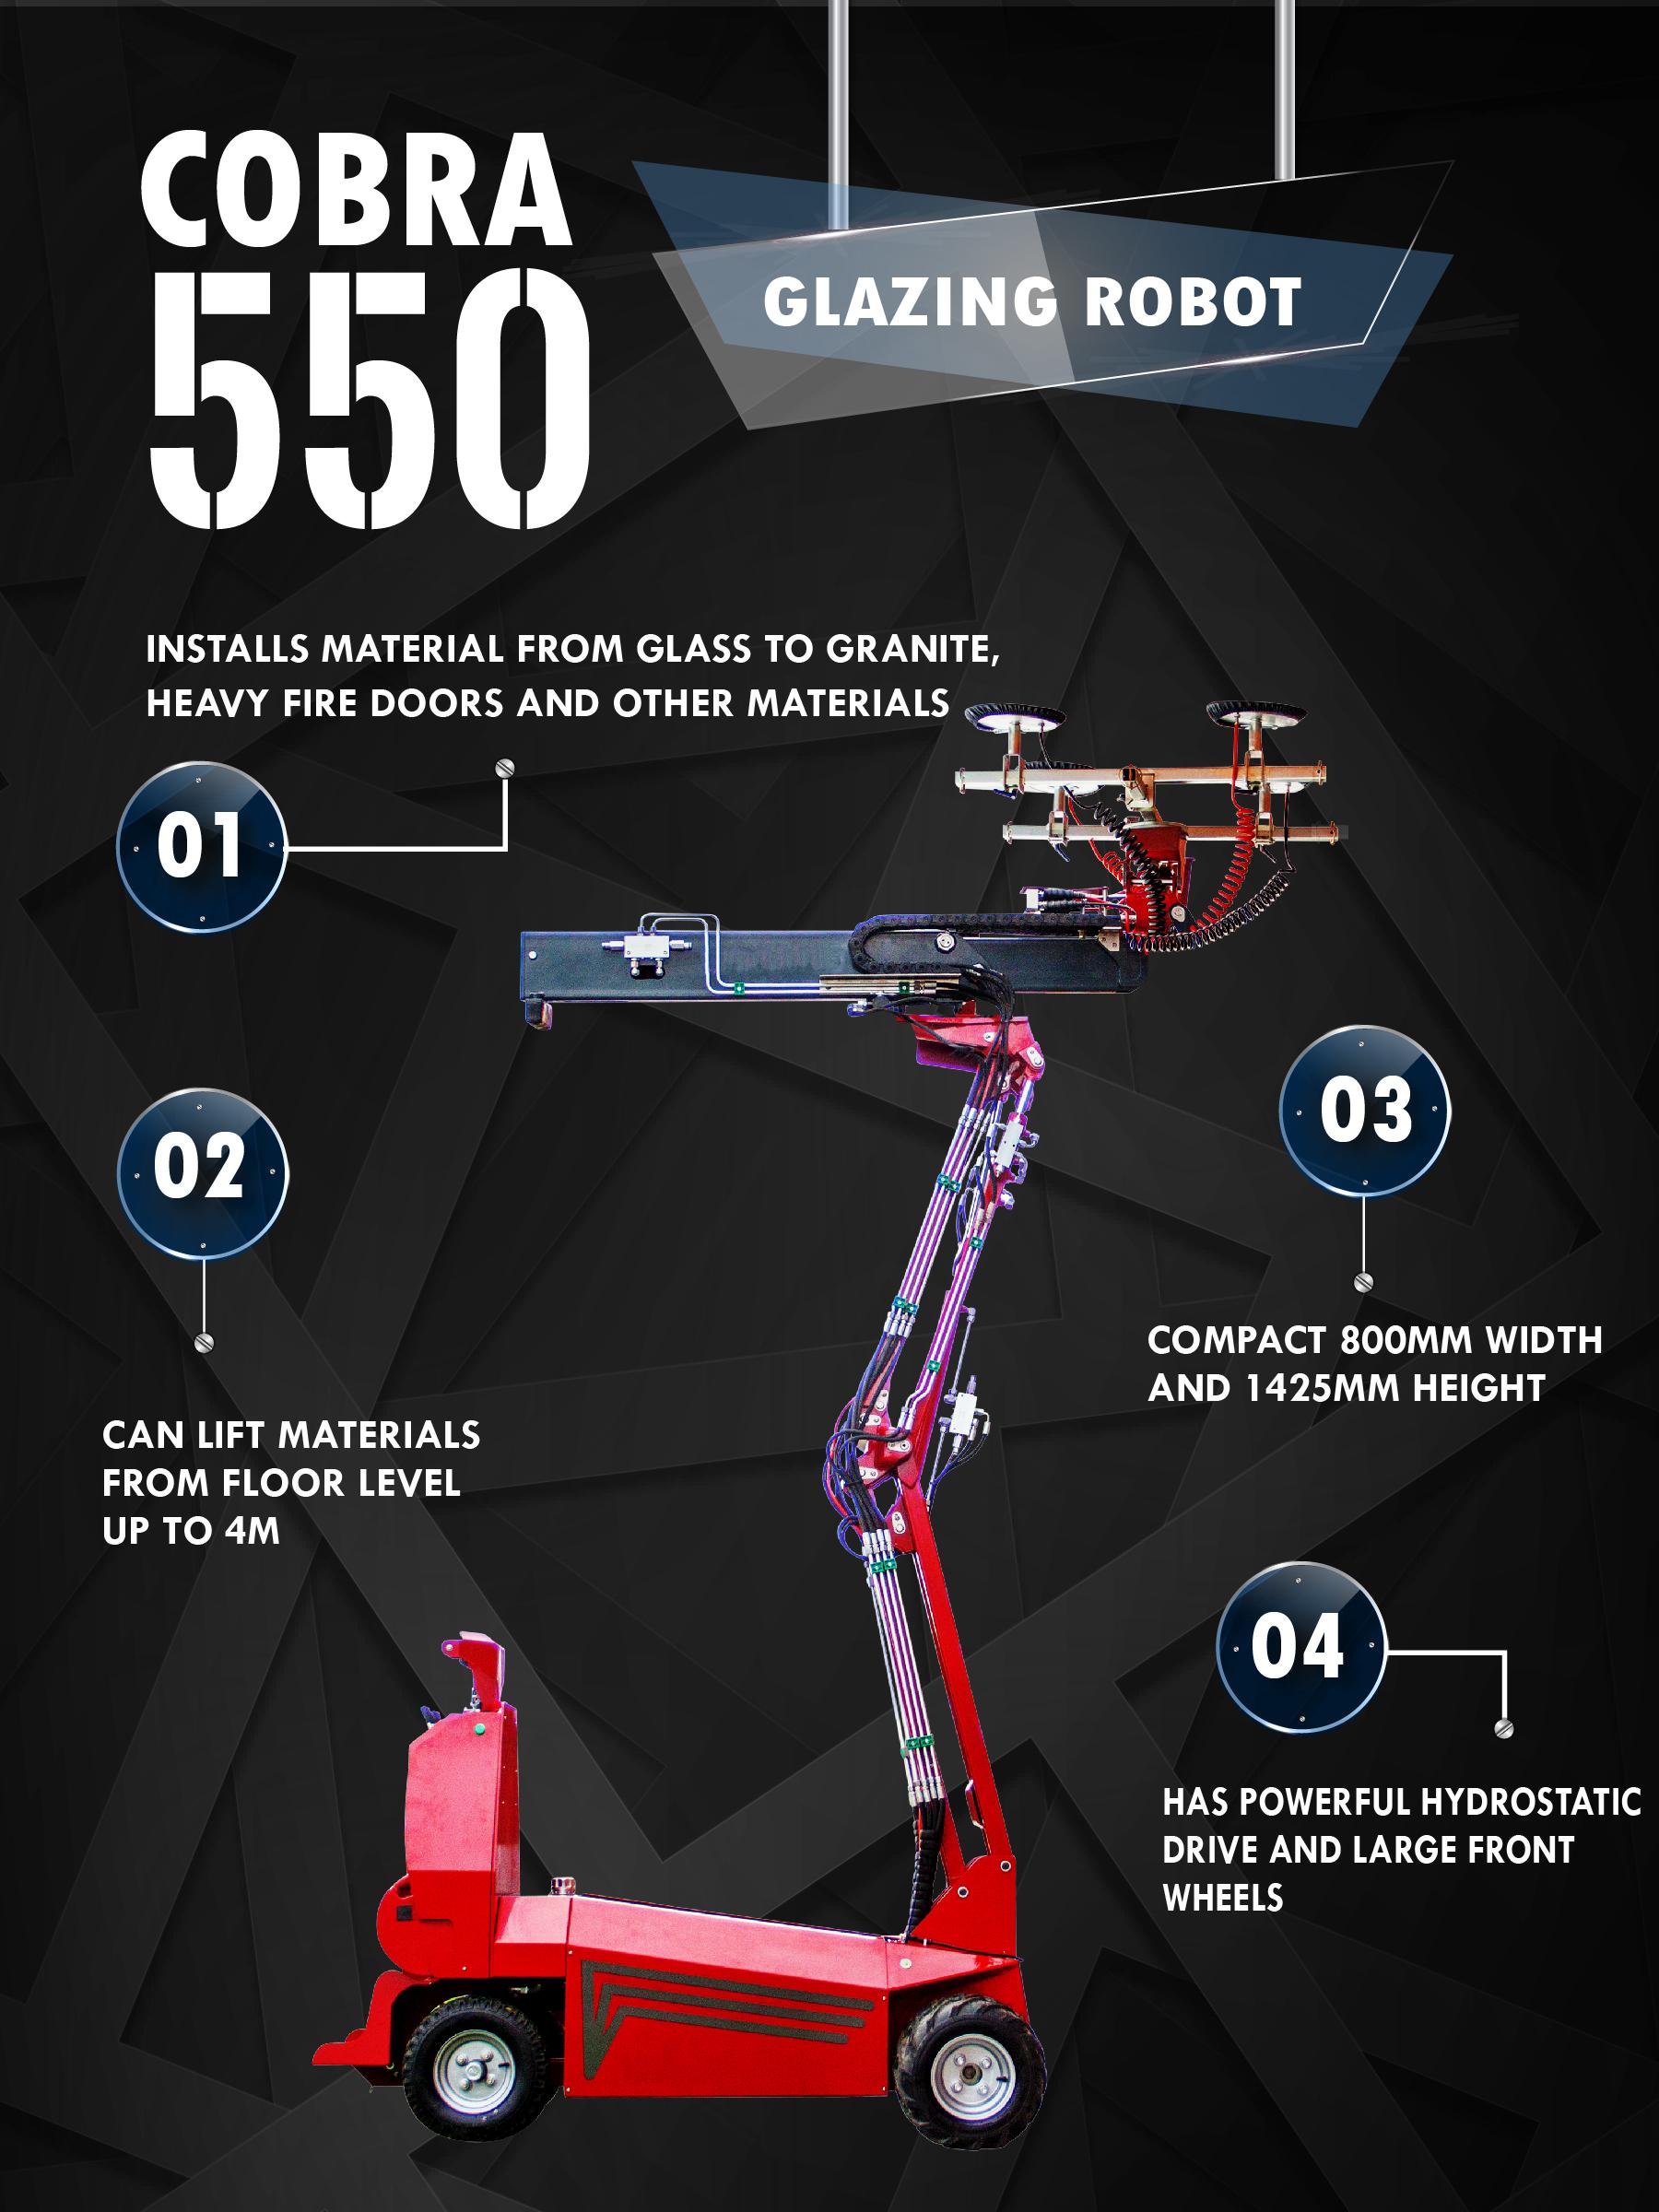 Cobra 550 Cover Infographic